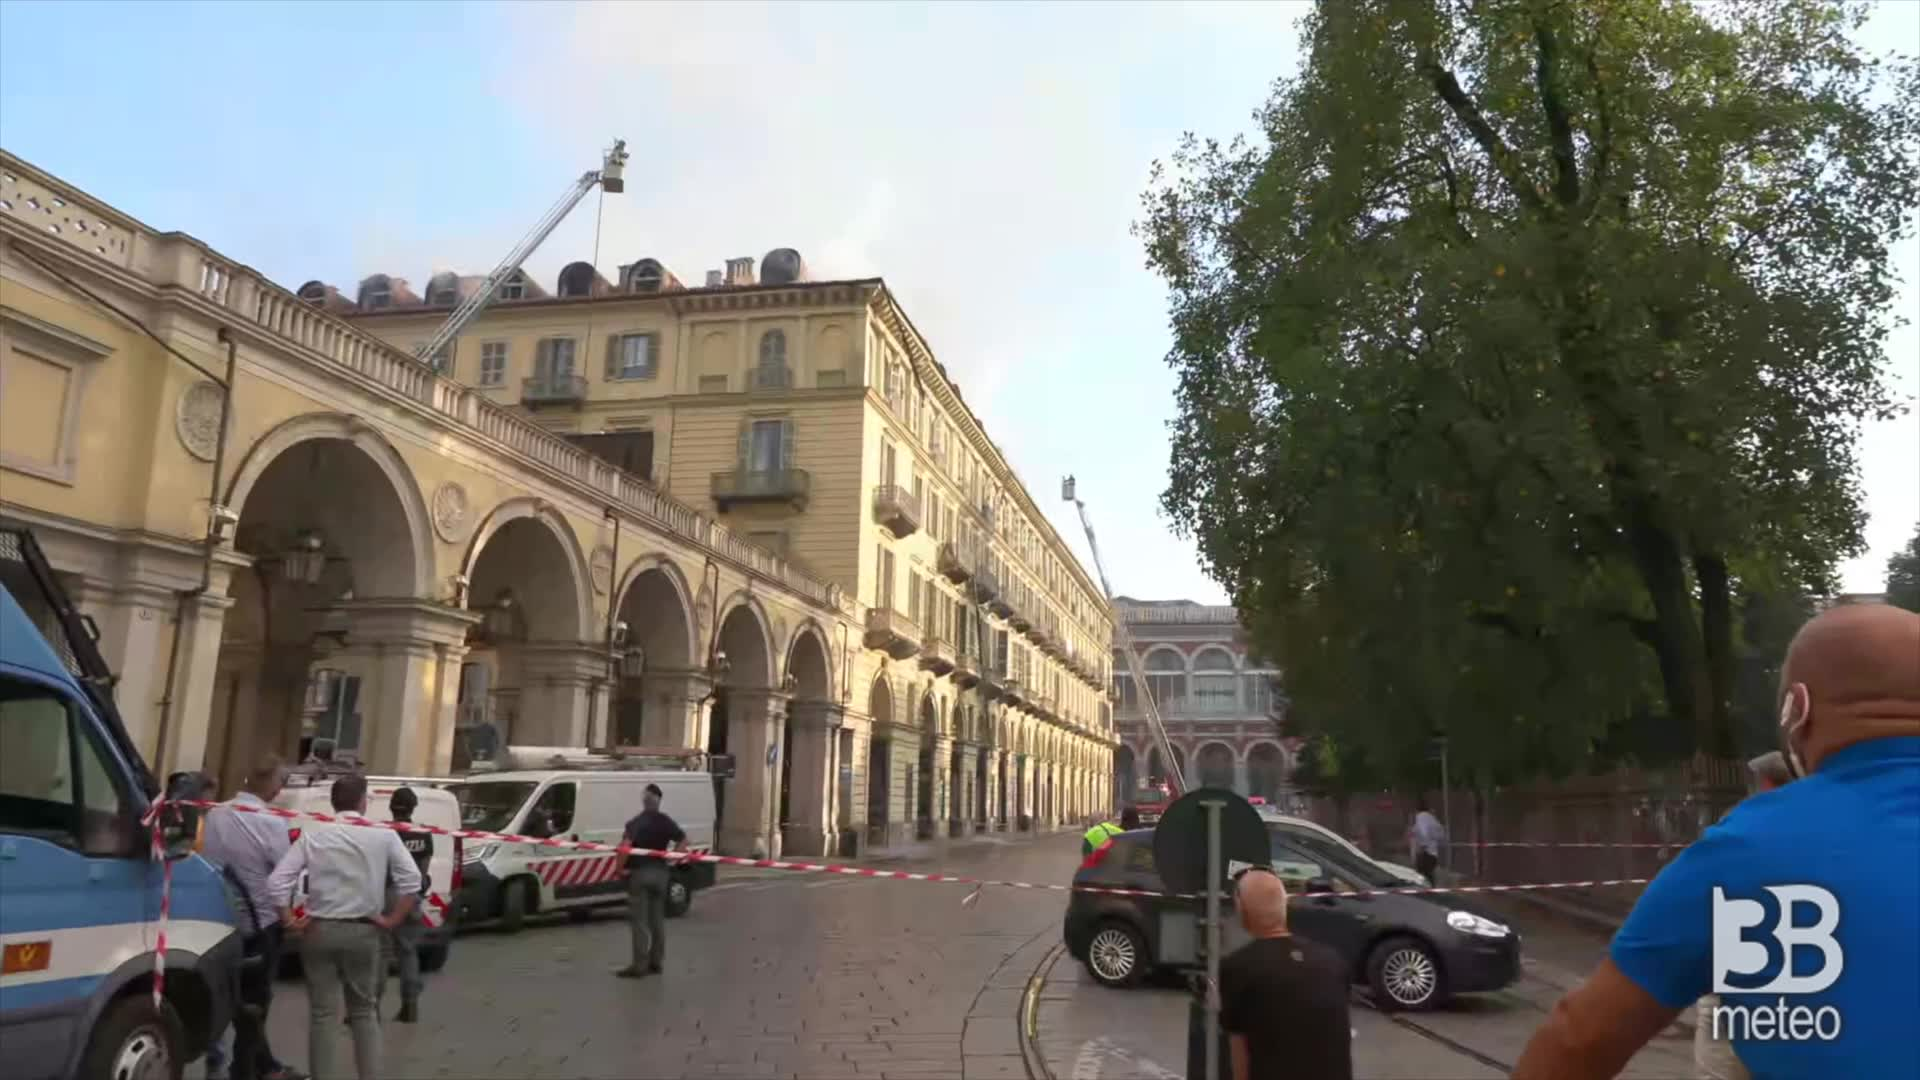 Incendio, grondaia cede e cade: fiamme attive da ore